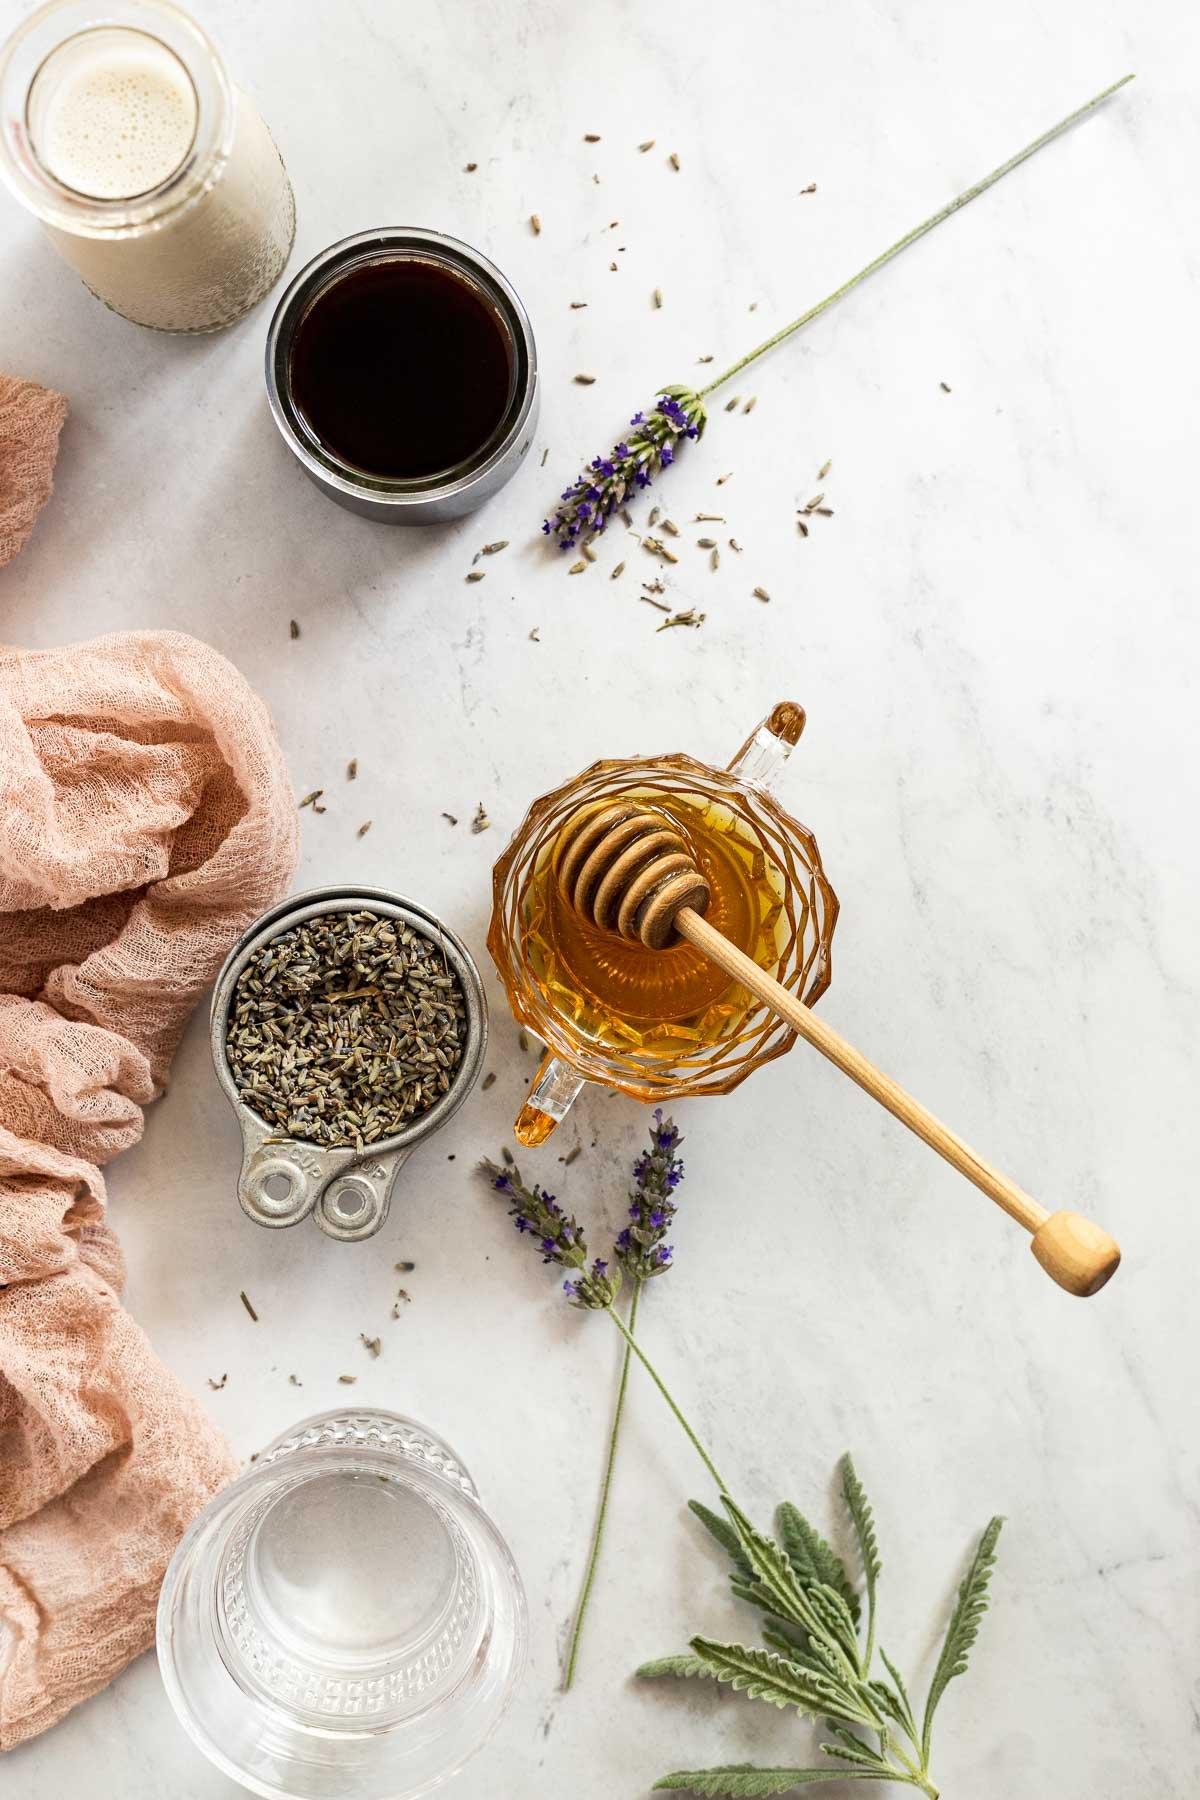 Jar of honey next to lavender, espresso, and oat milk.